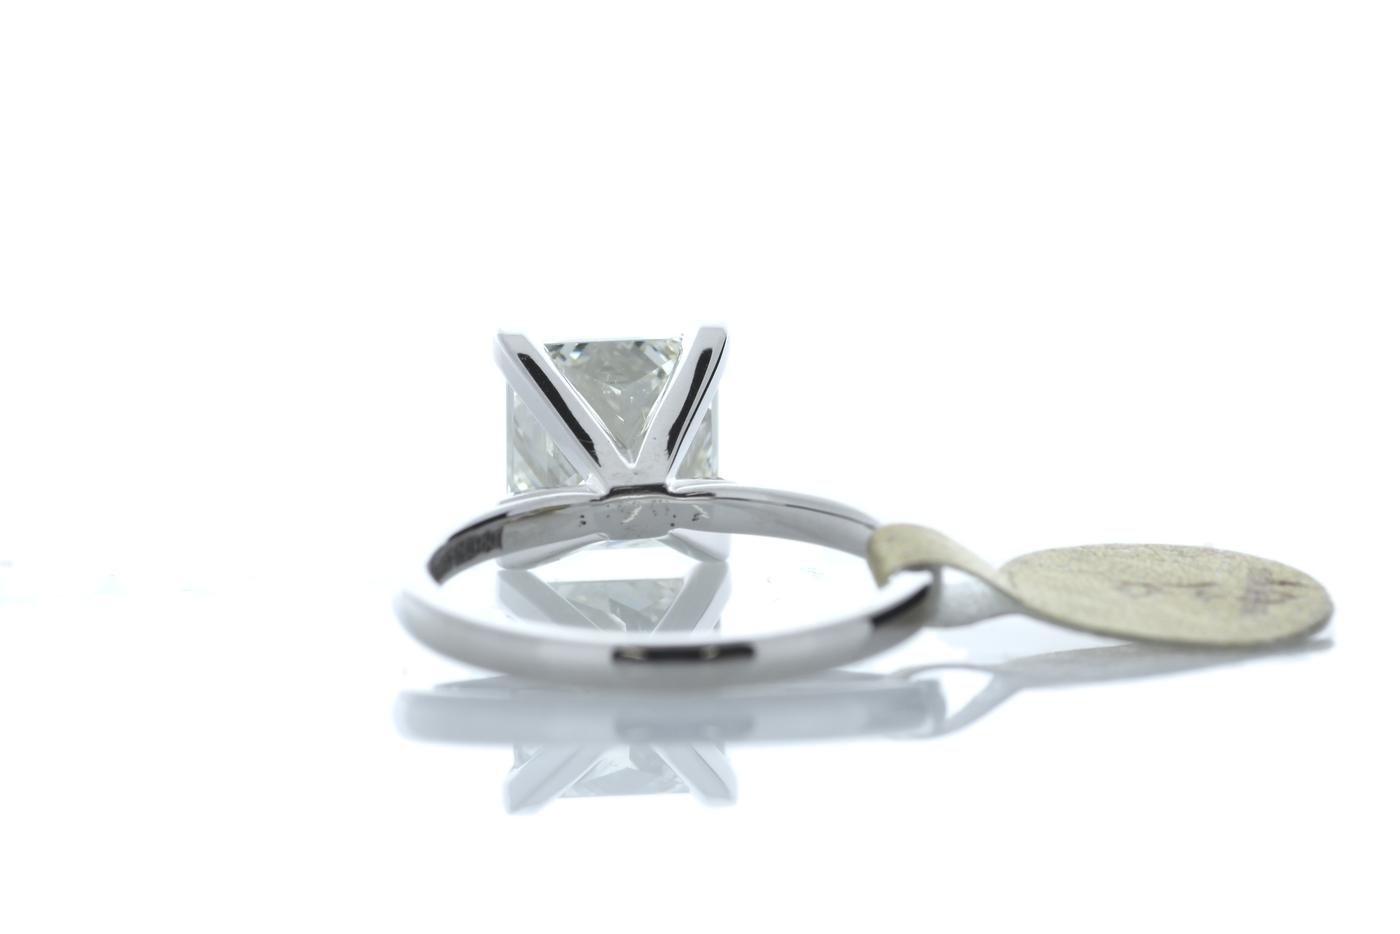 18ct White Gold Princess Cut Diamond Ring 3.09 Carats - Image 3 of 4